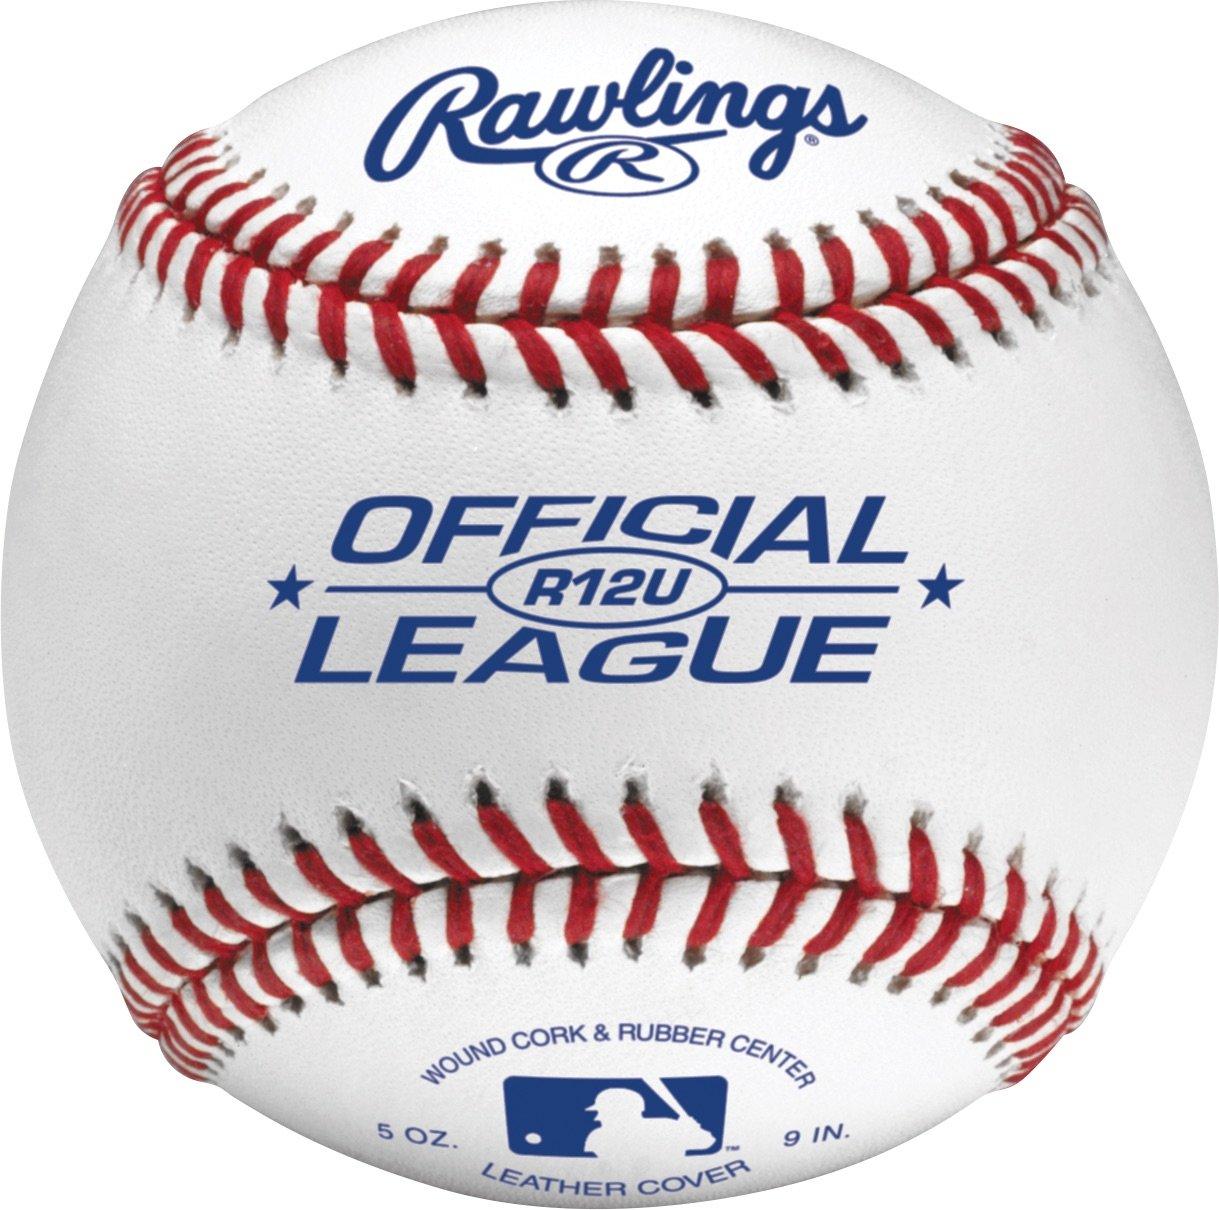 Rawlings Youth 12U Game Play Baseballs, (Box of 24), R12USW2-24